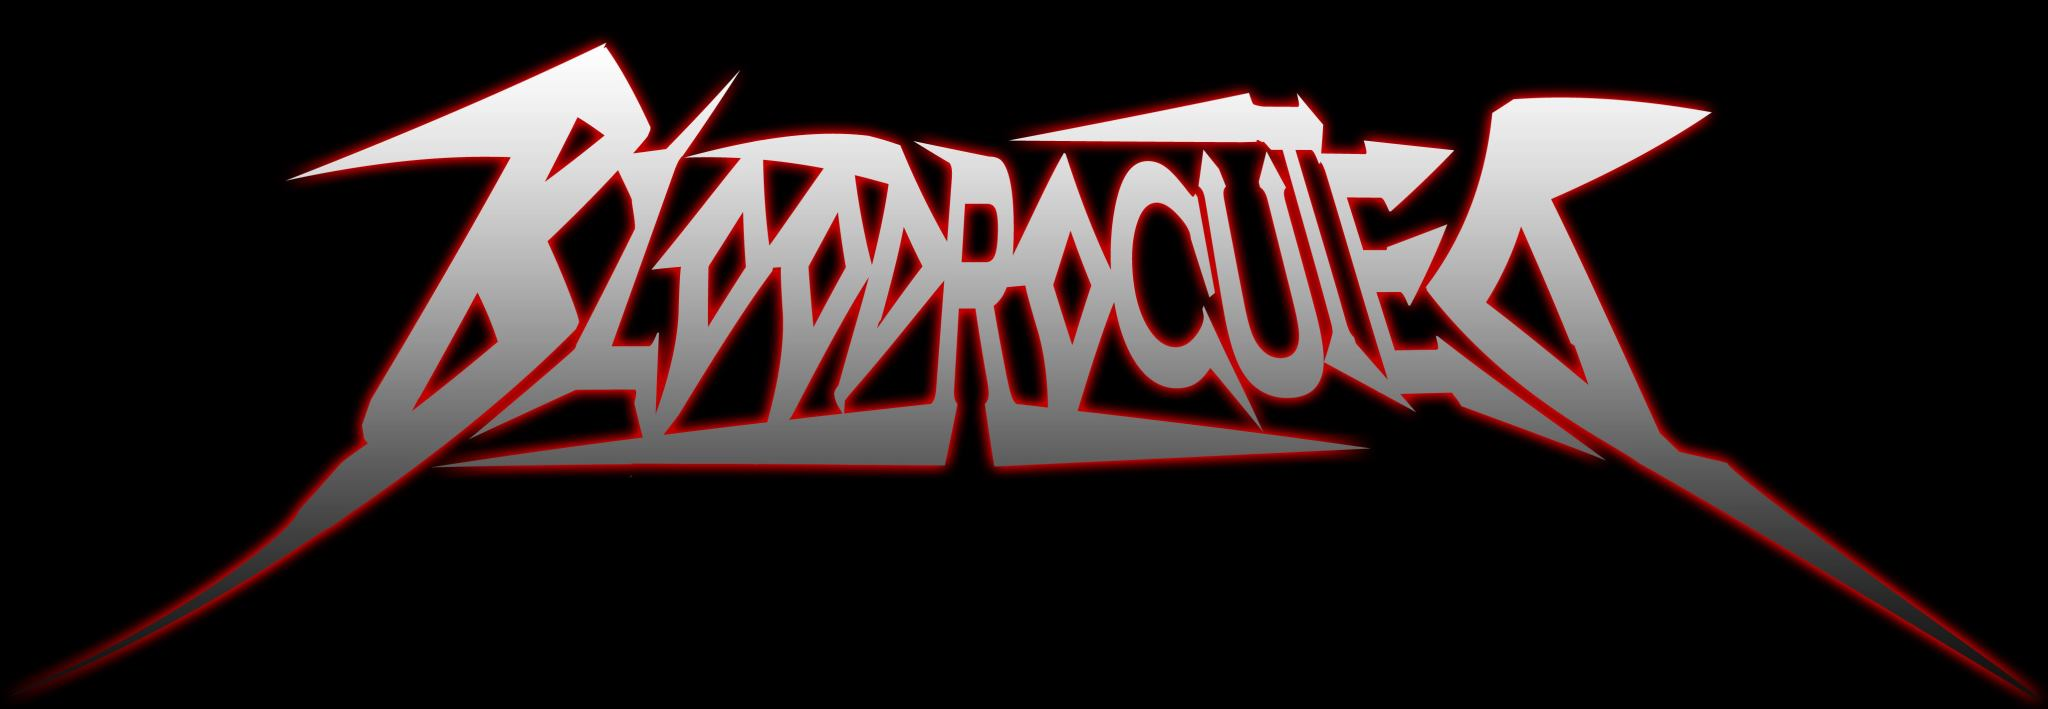 Bloodrocuted